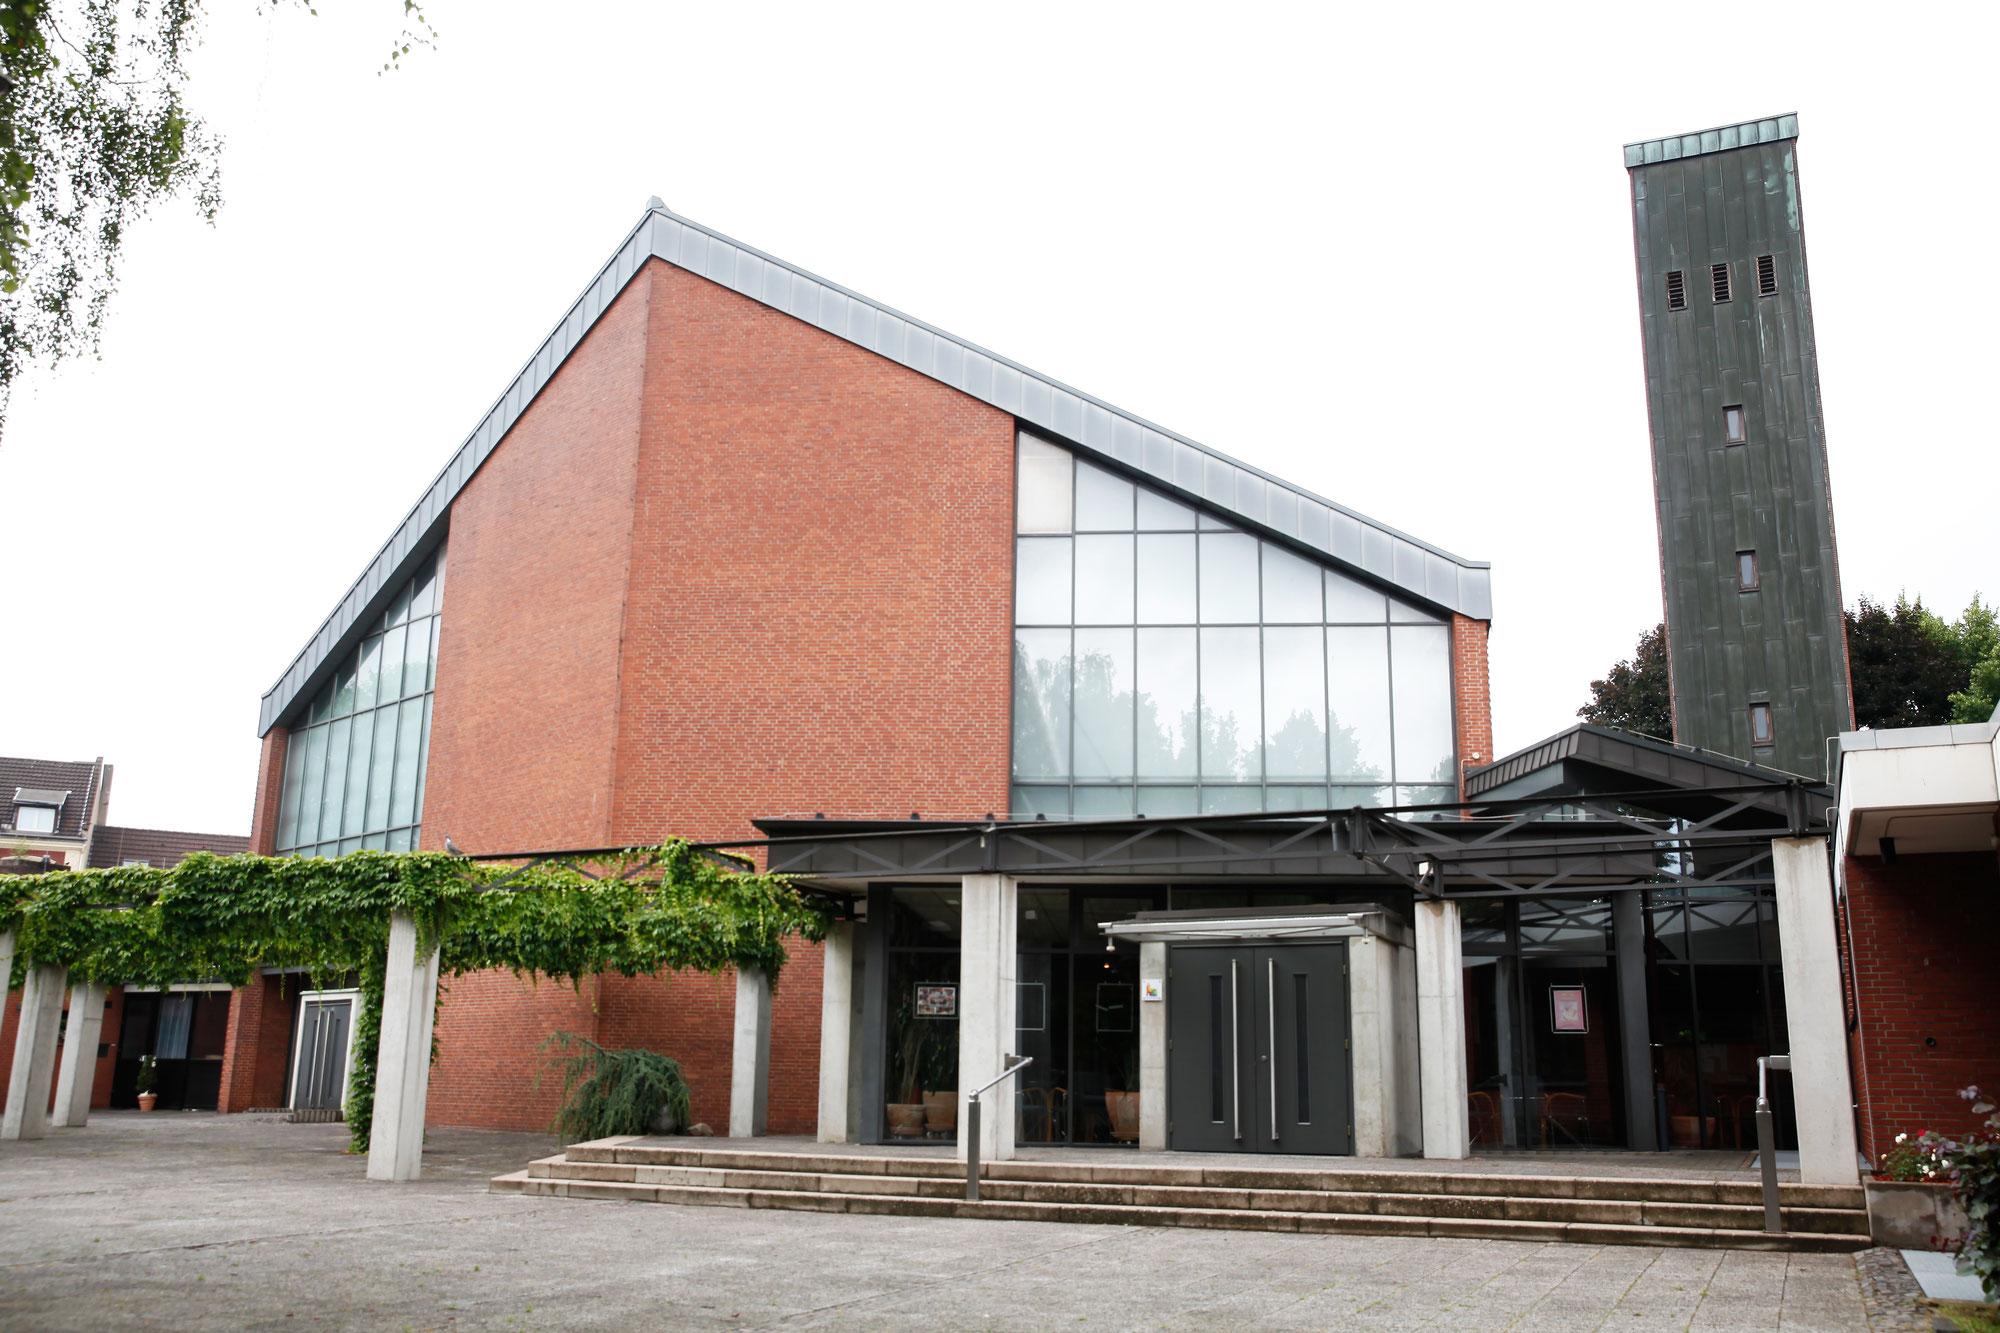 Evangelische Kirche in Duisburg